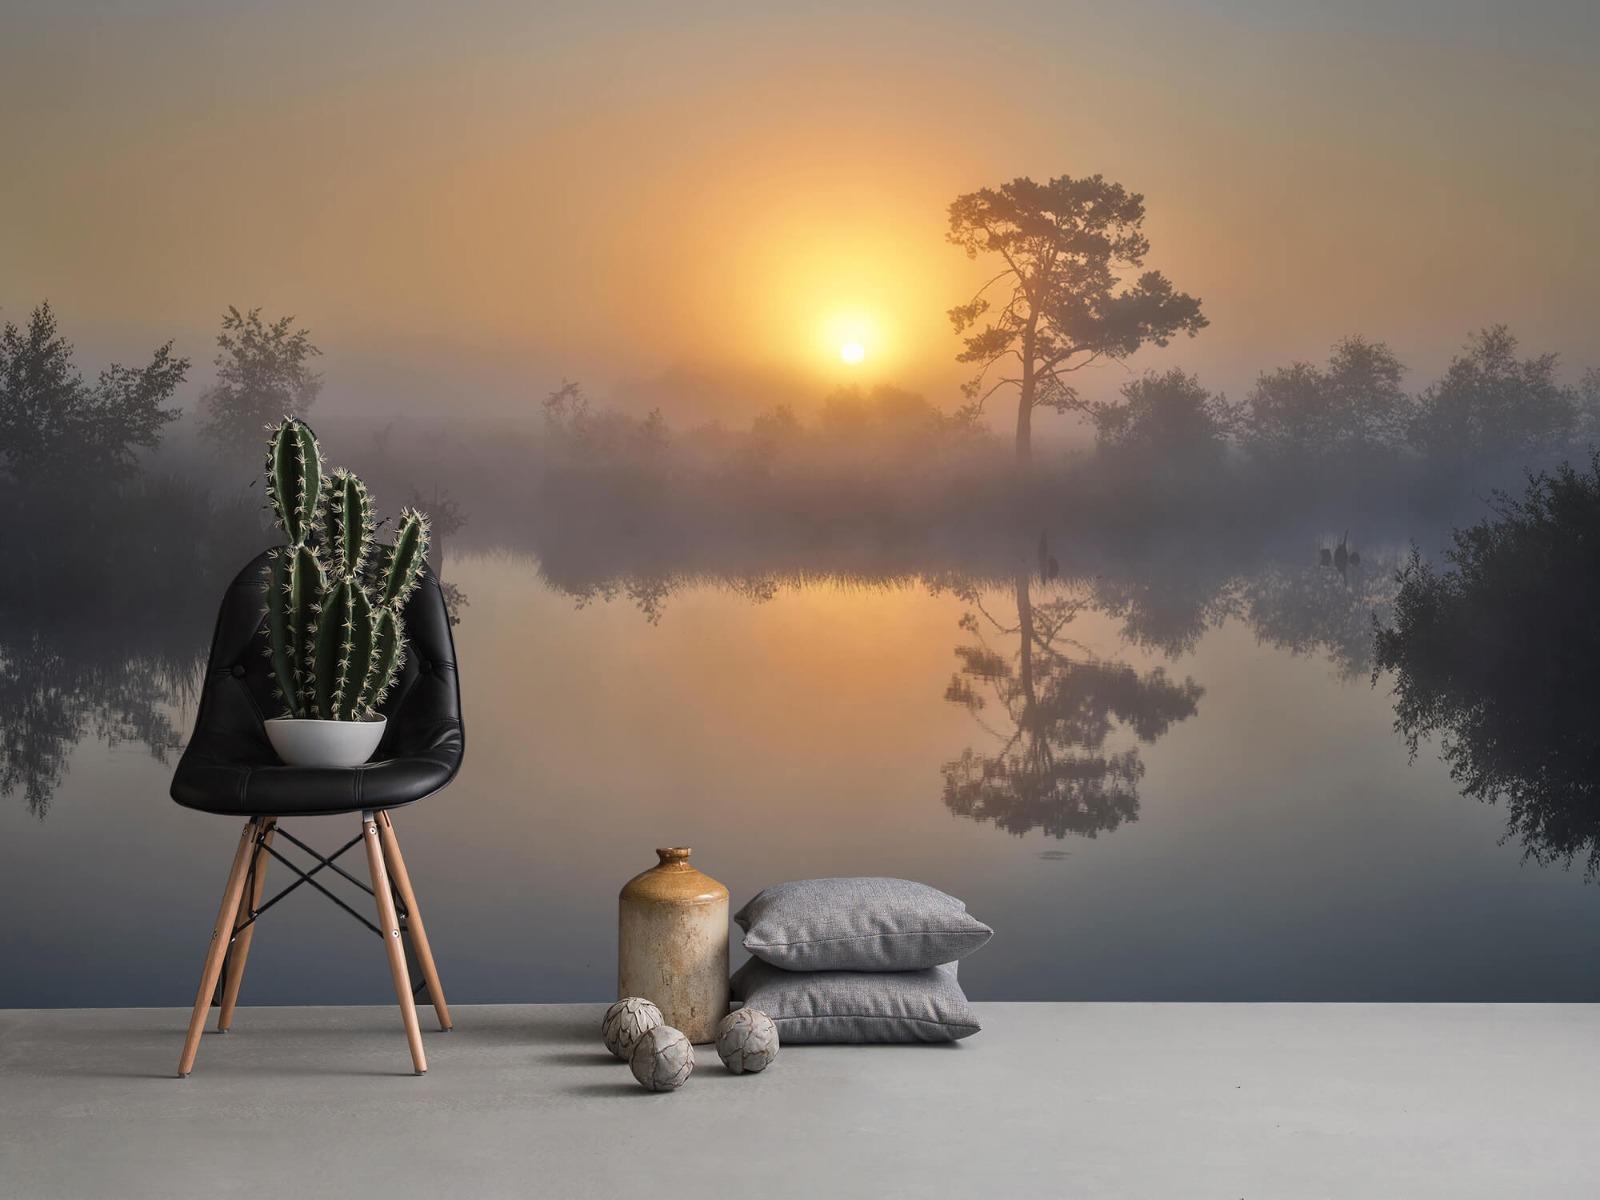 Natuur - Mistige zonsopkomst 14